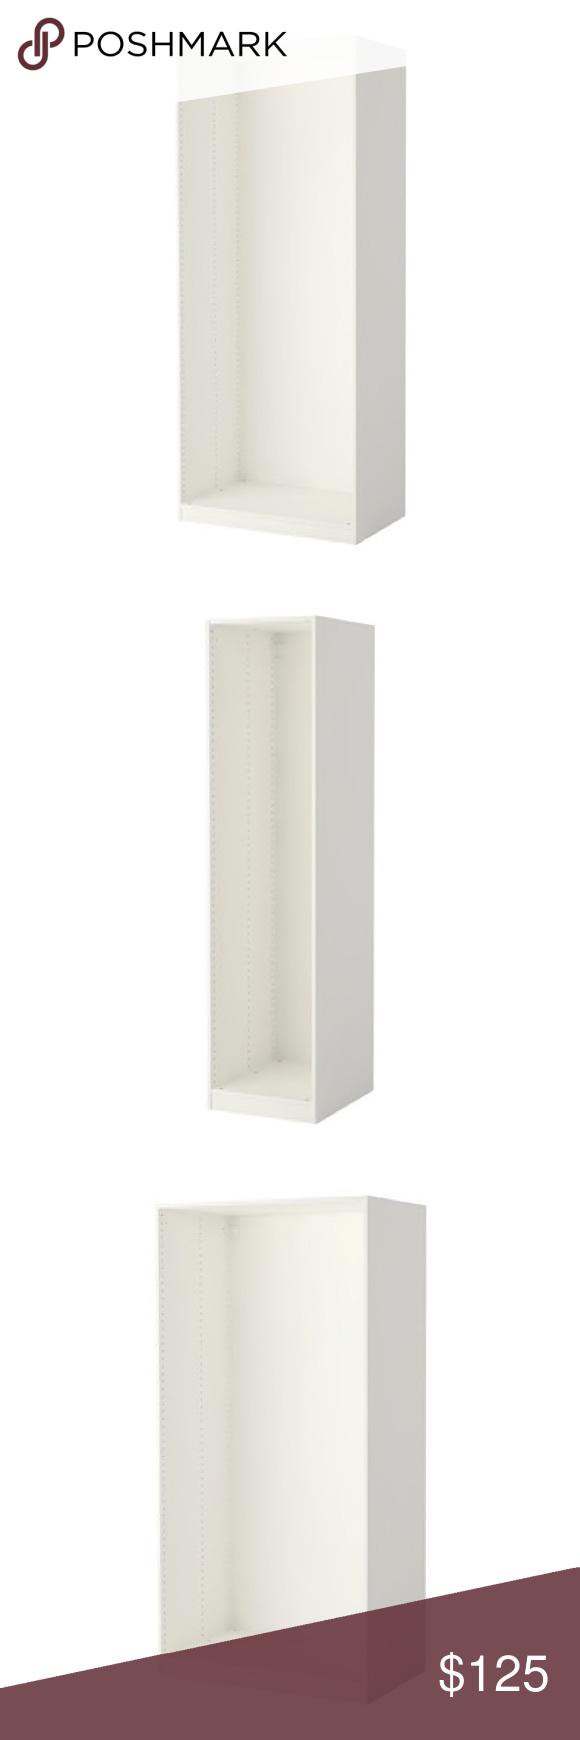 Wardrobe Beautiful white IKEA Pax wardrobe  Comes in 2 different